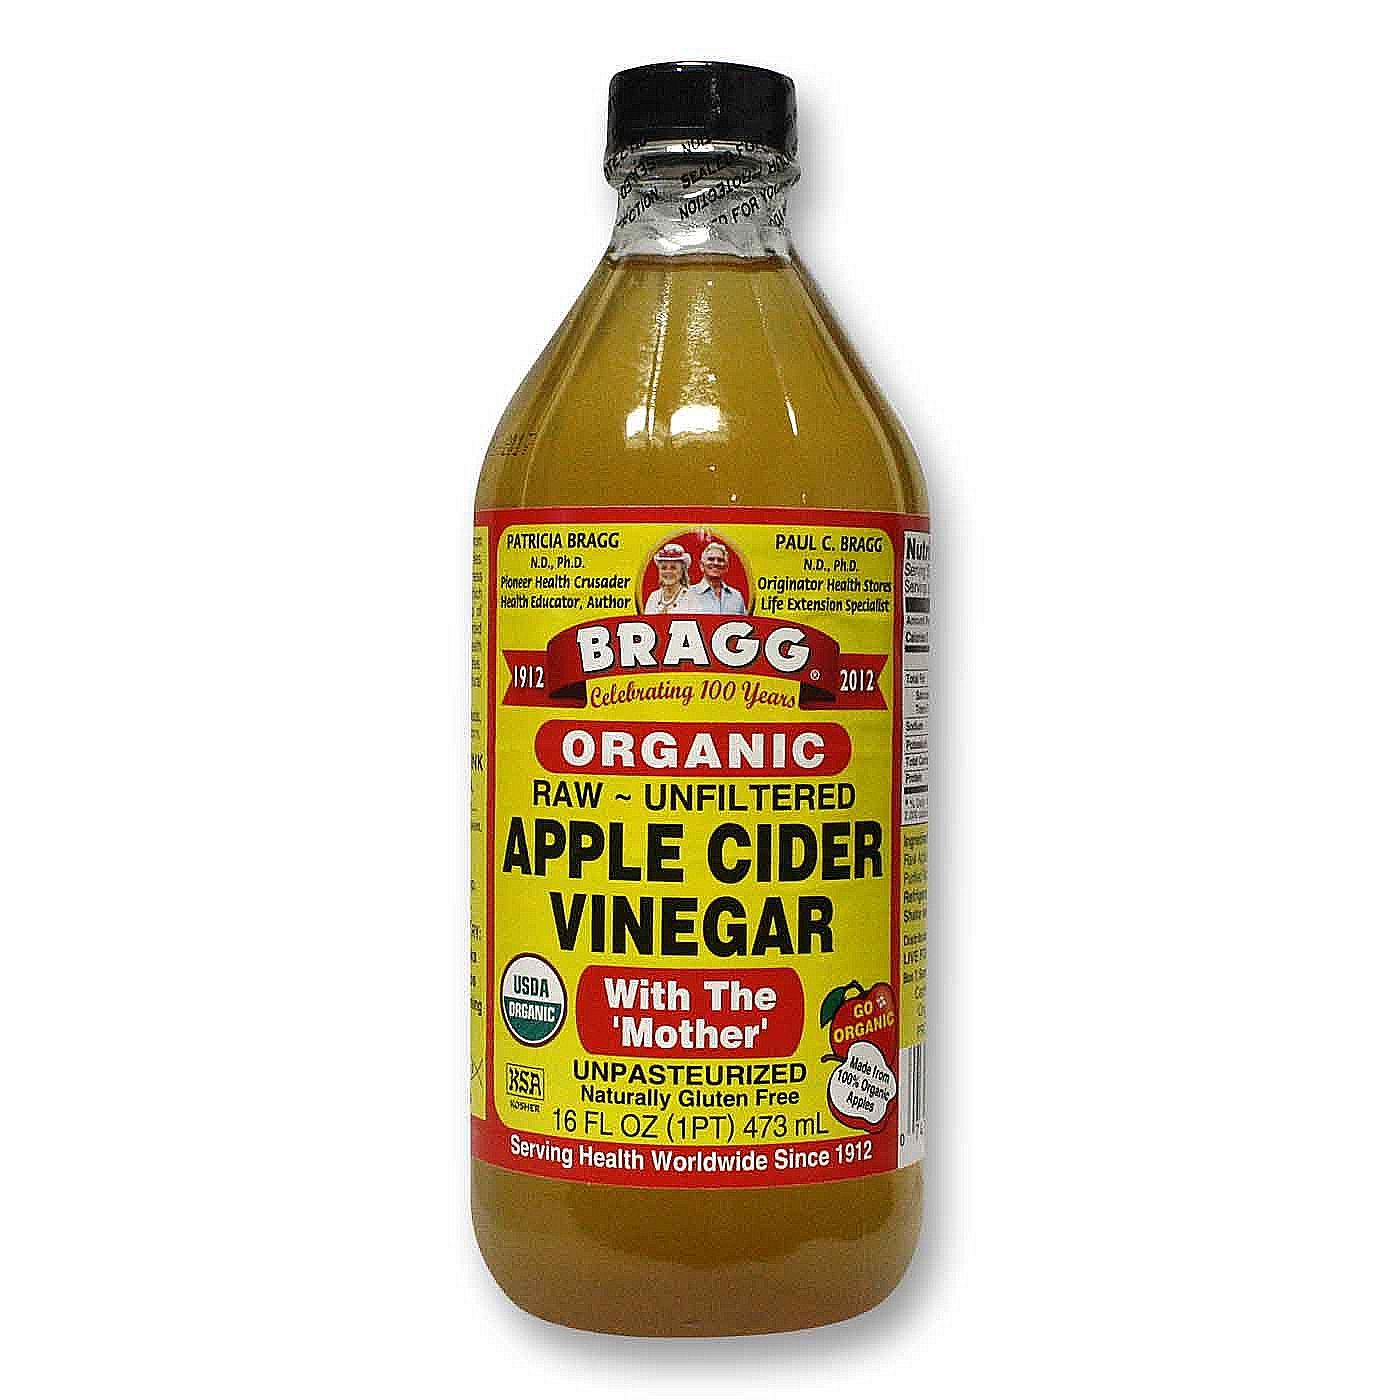 Bragg Apple Cider Vinegar Organic 16 Fl Oz Evitamins Saudi Arabia